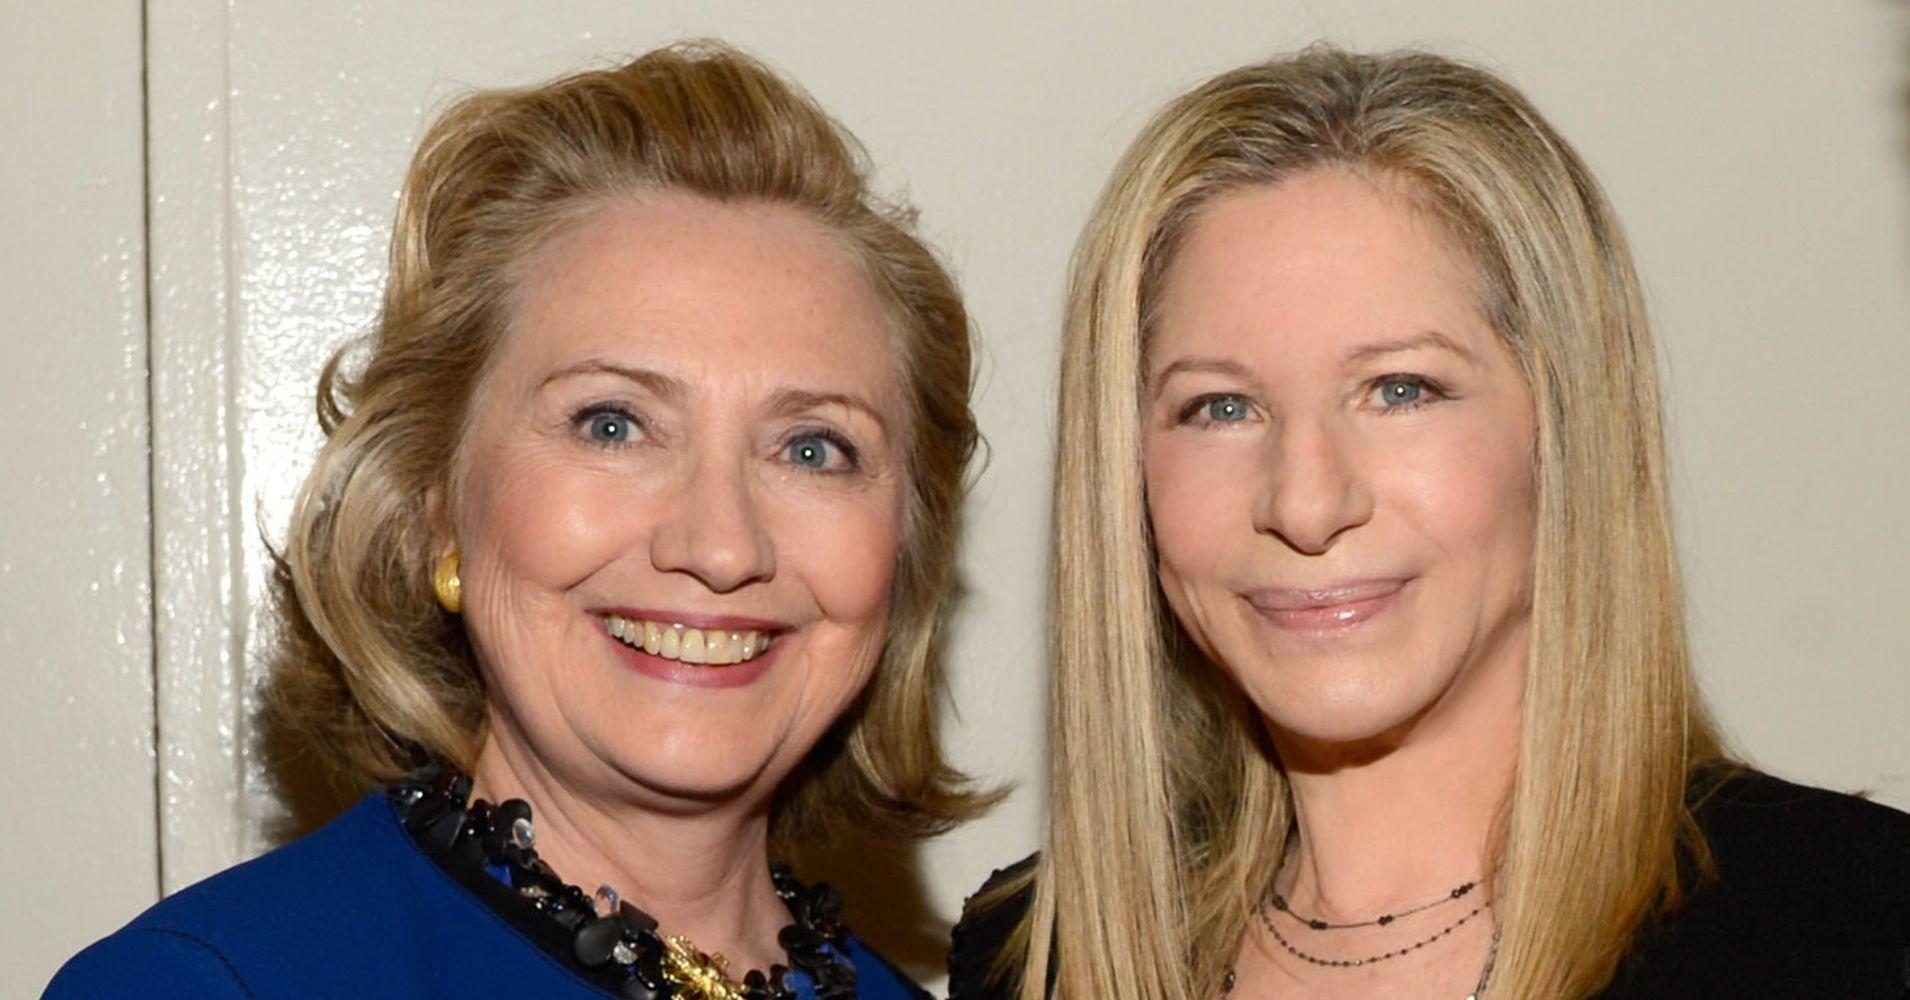 Barbra Streisand Admits Hillary Clinton's Loss Was 'Heartbreaking'